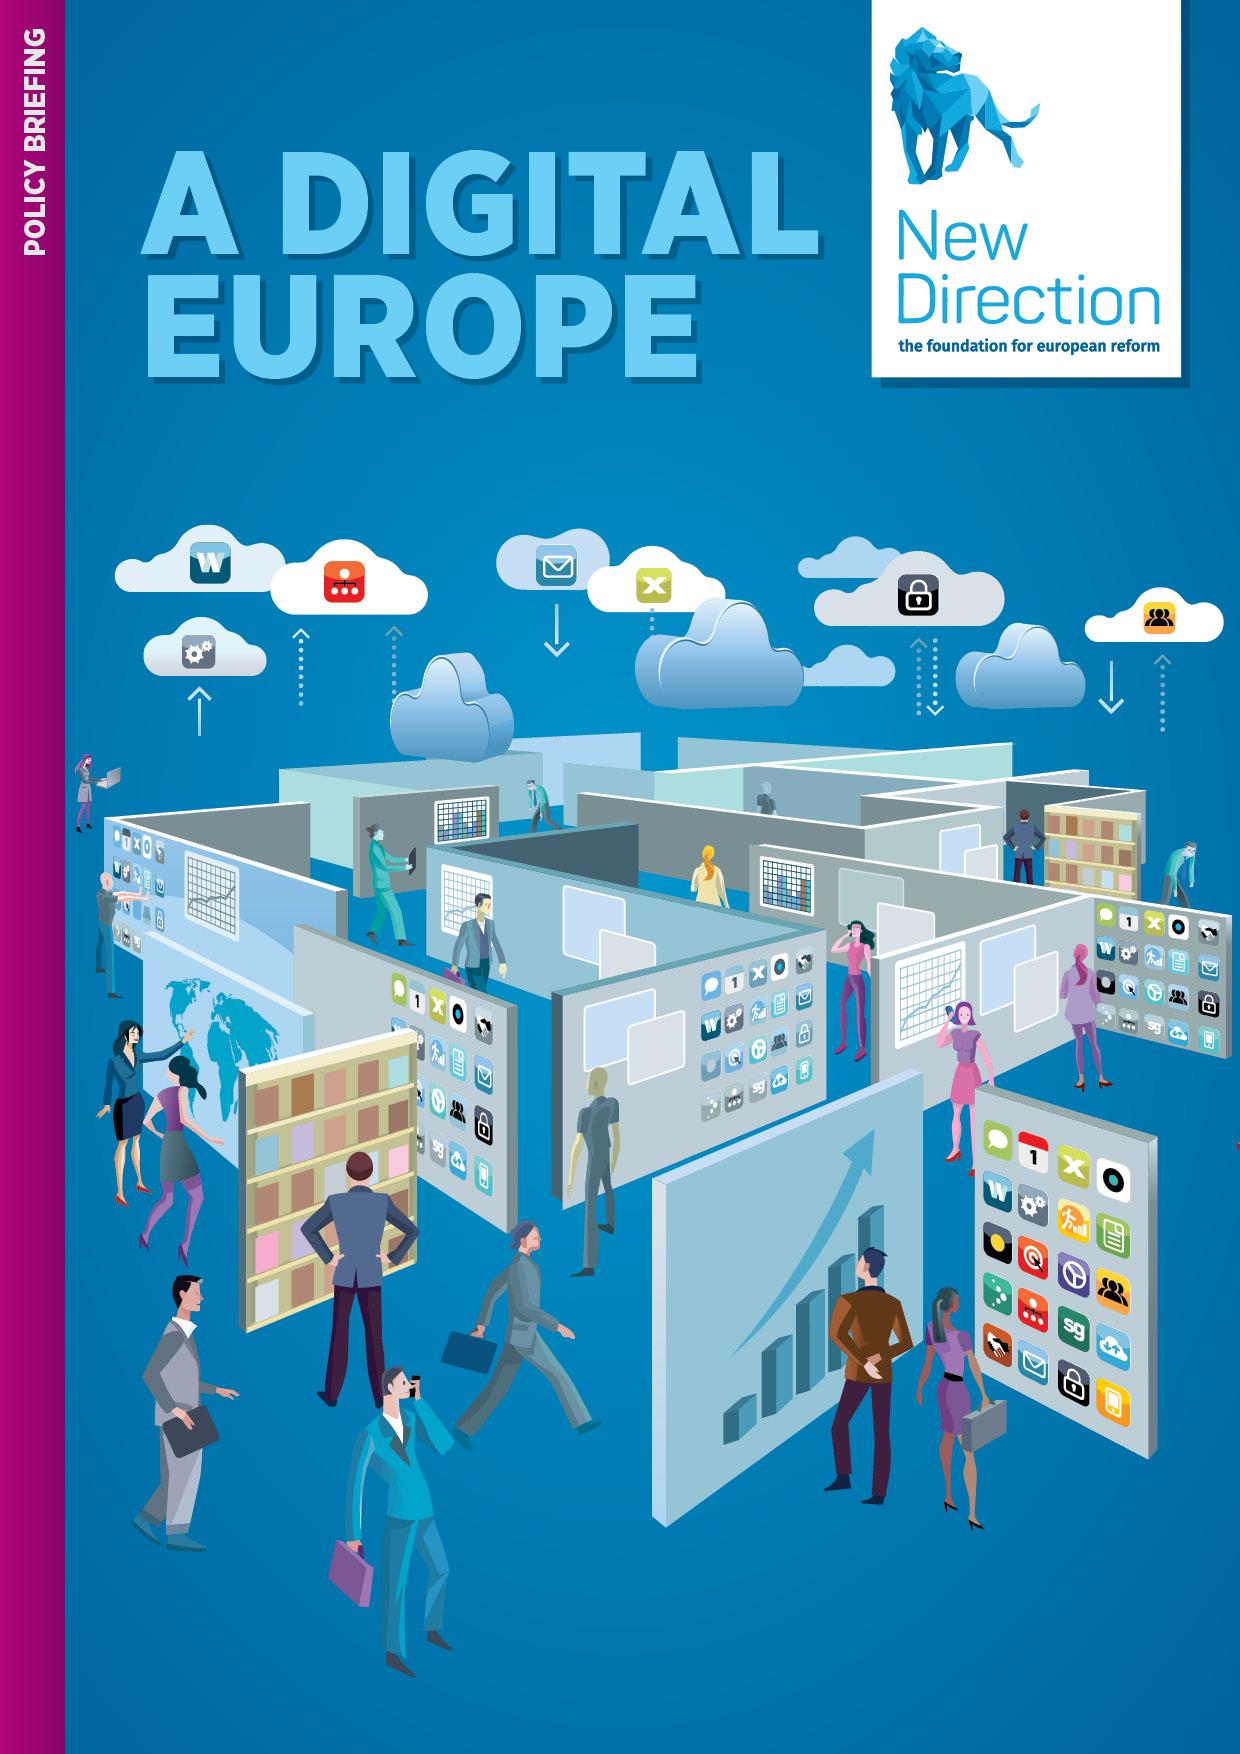 A Digital Europe